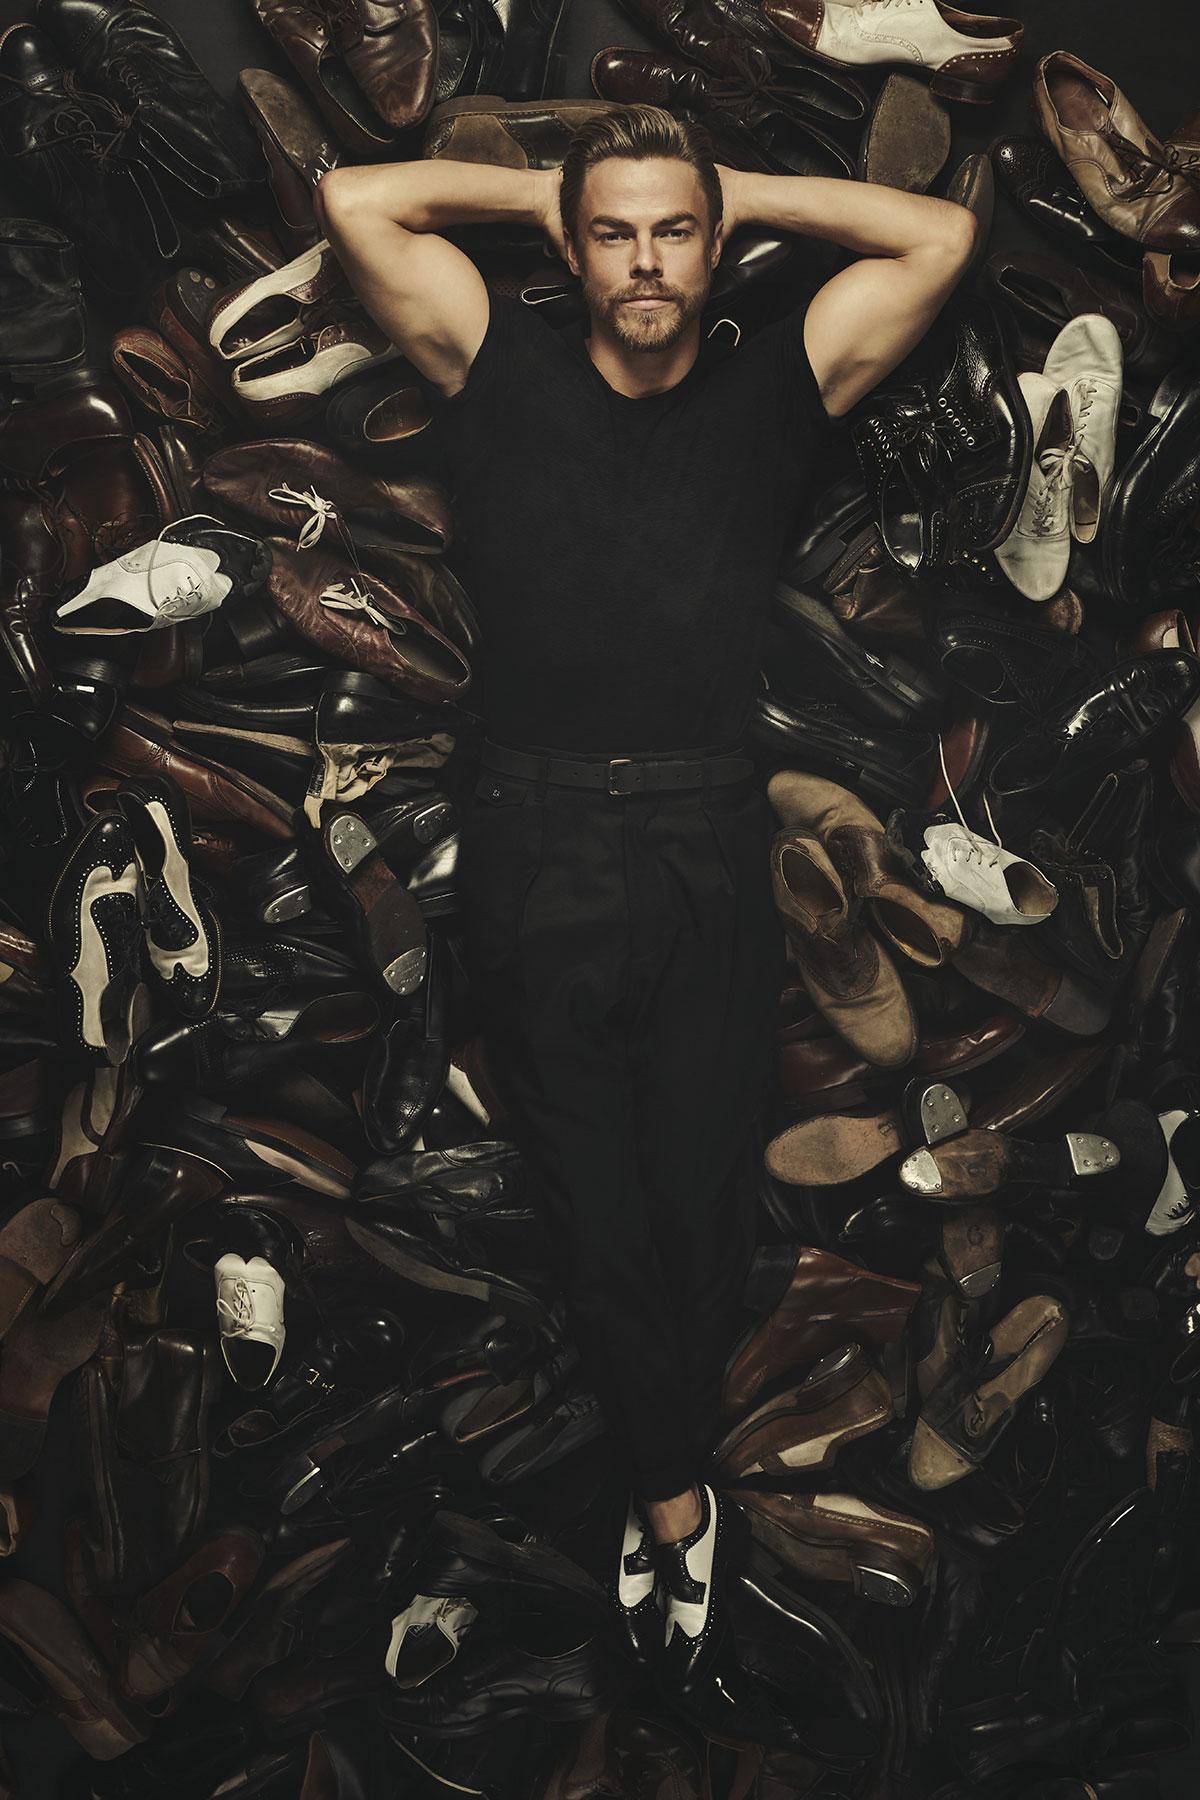 Derek Hough Live – The Tour